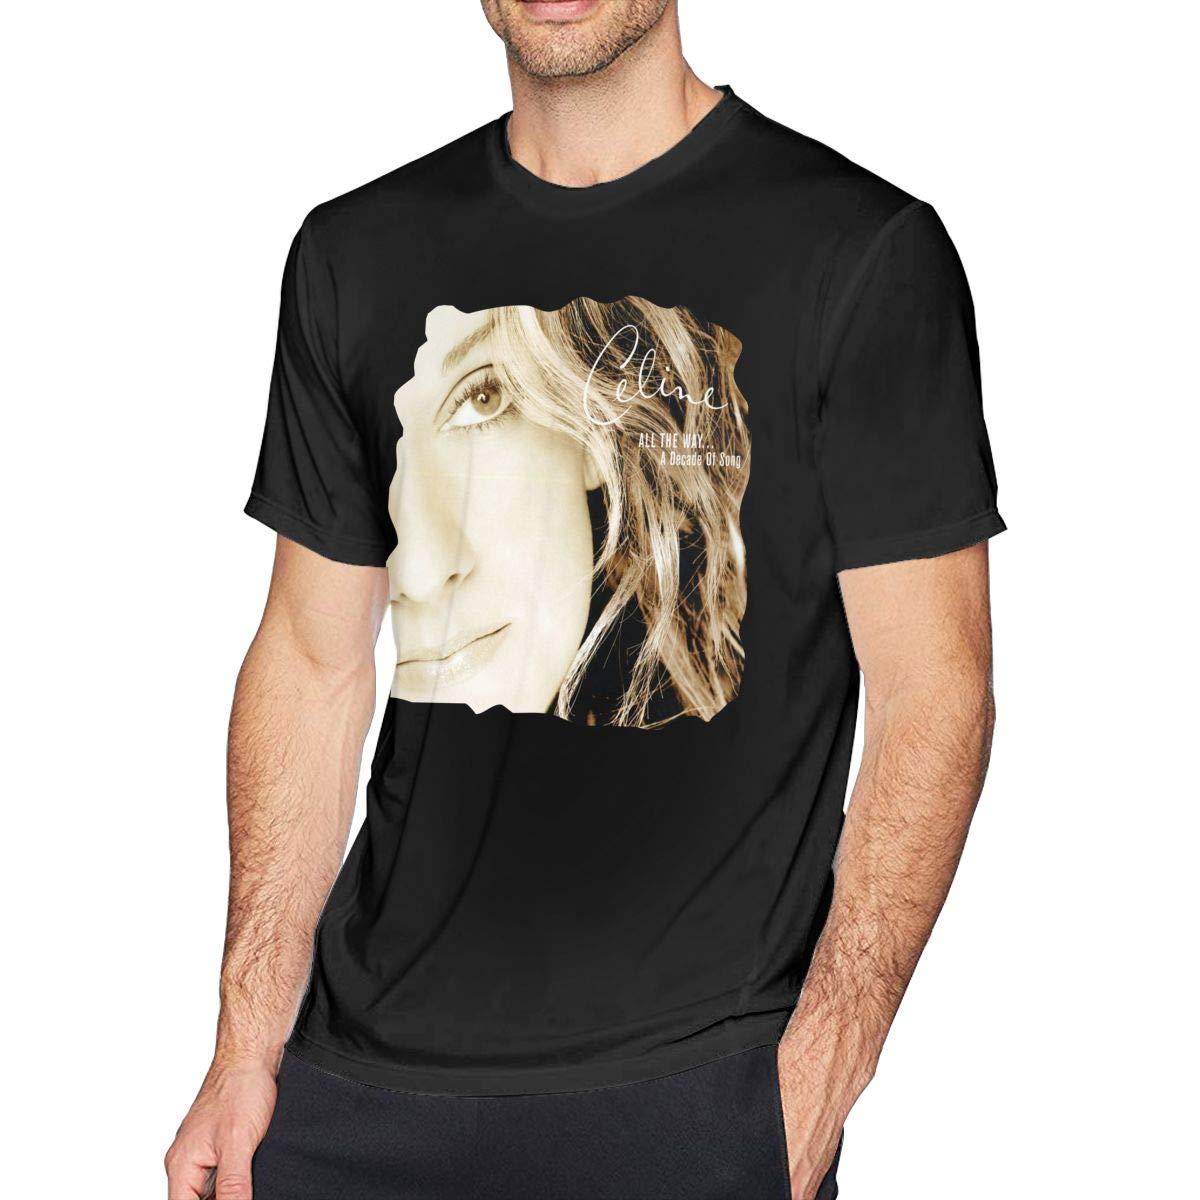 Superlee Celine Dion S Classic T Shirt Black